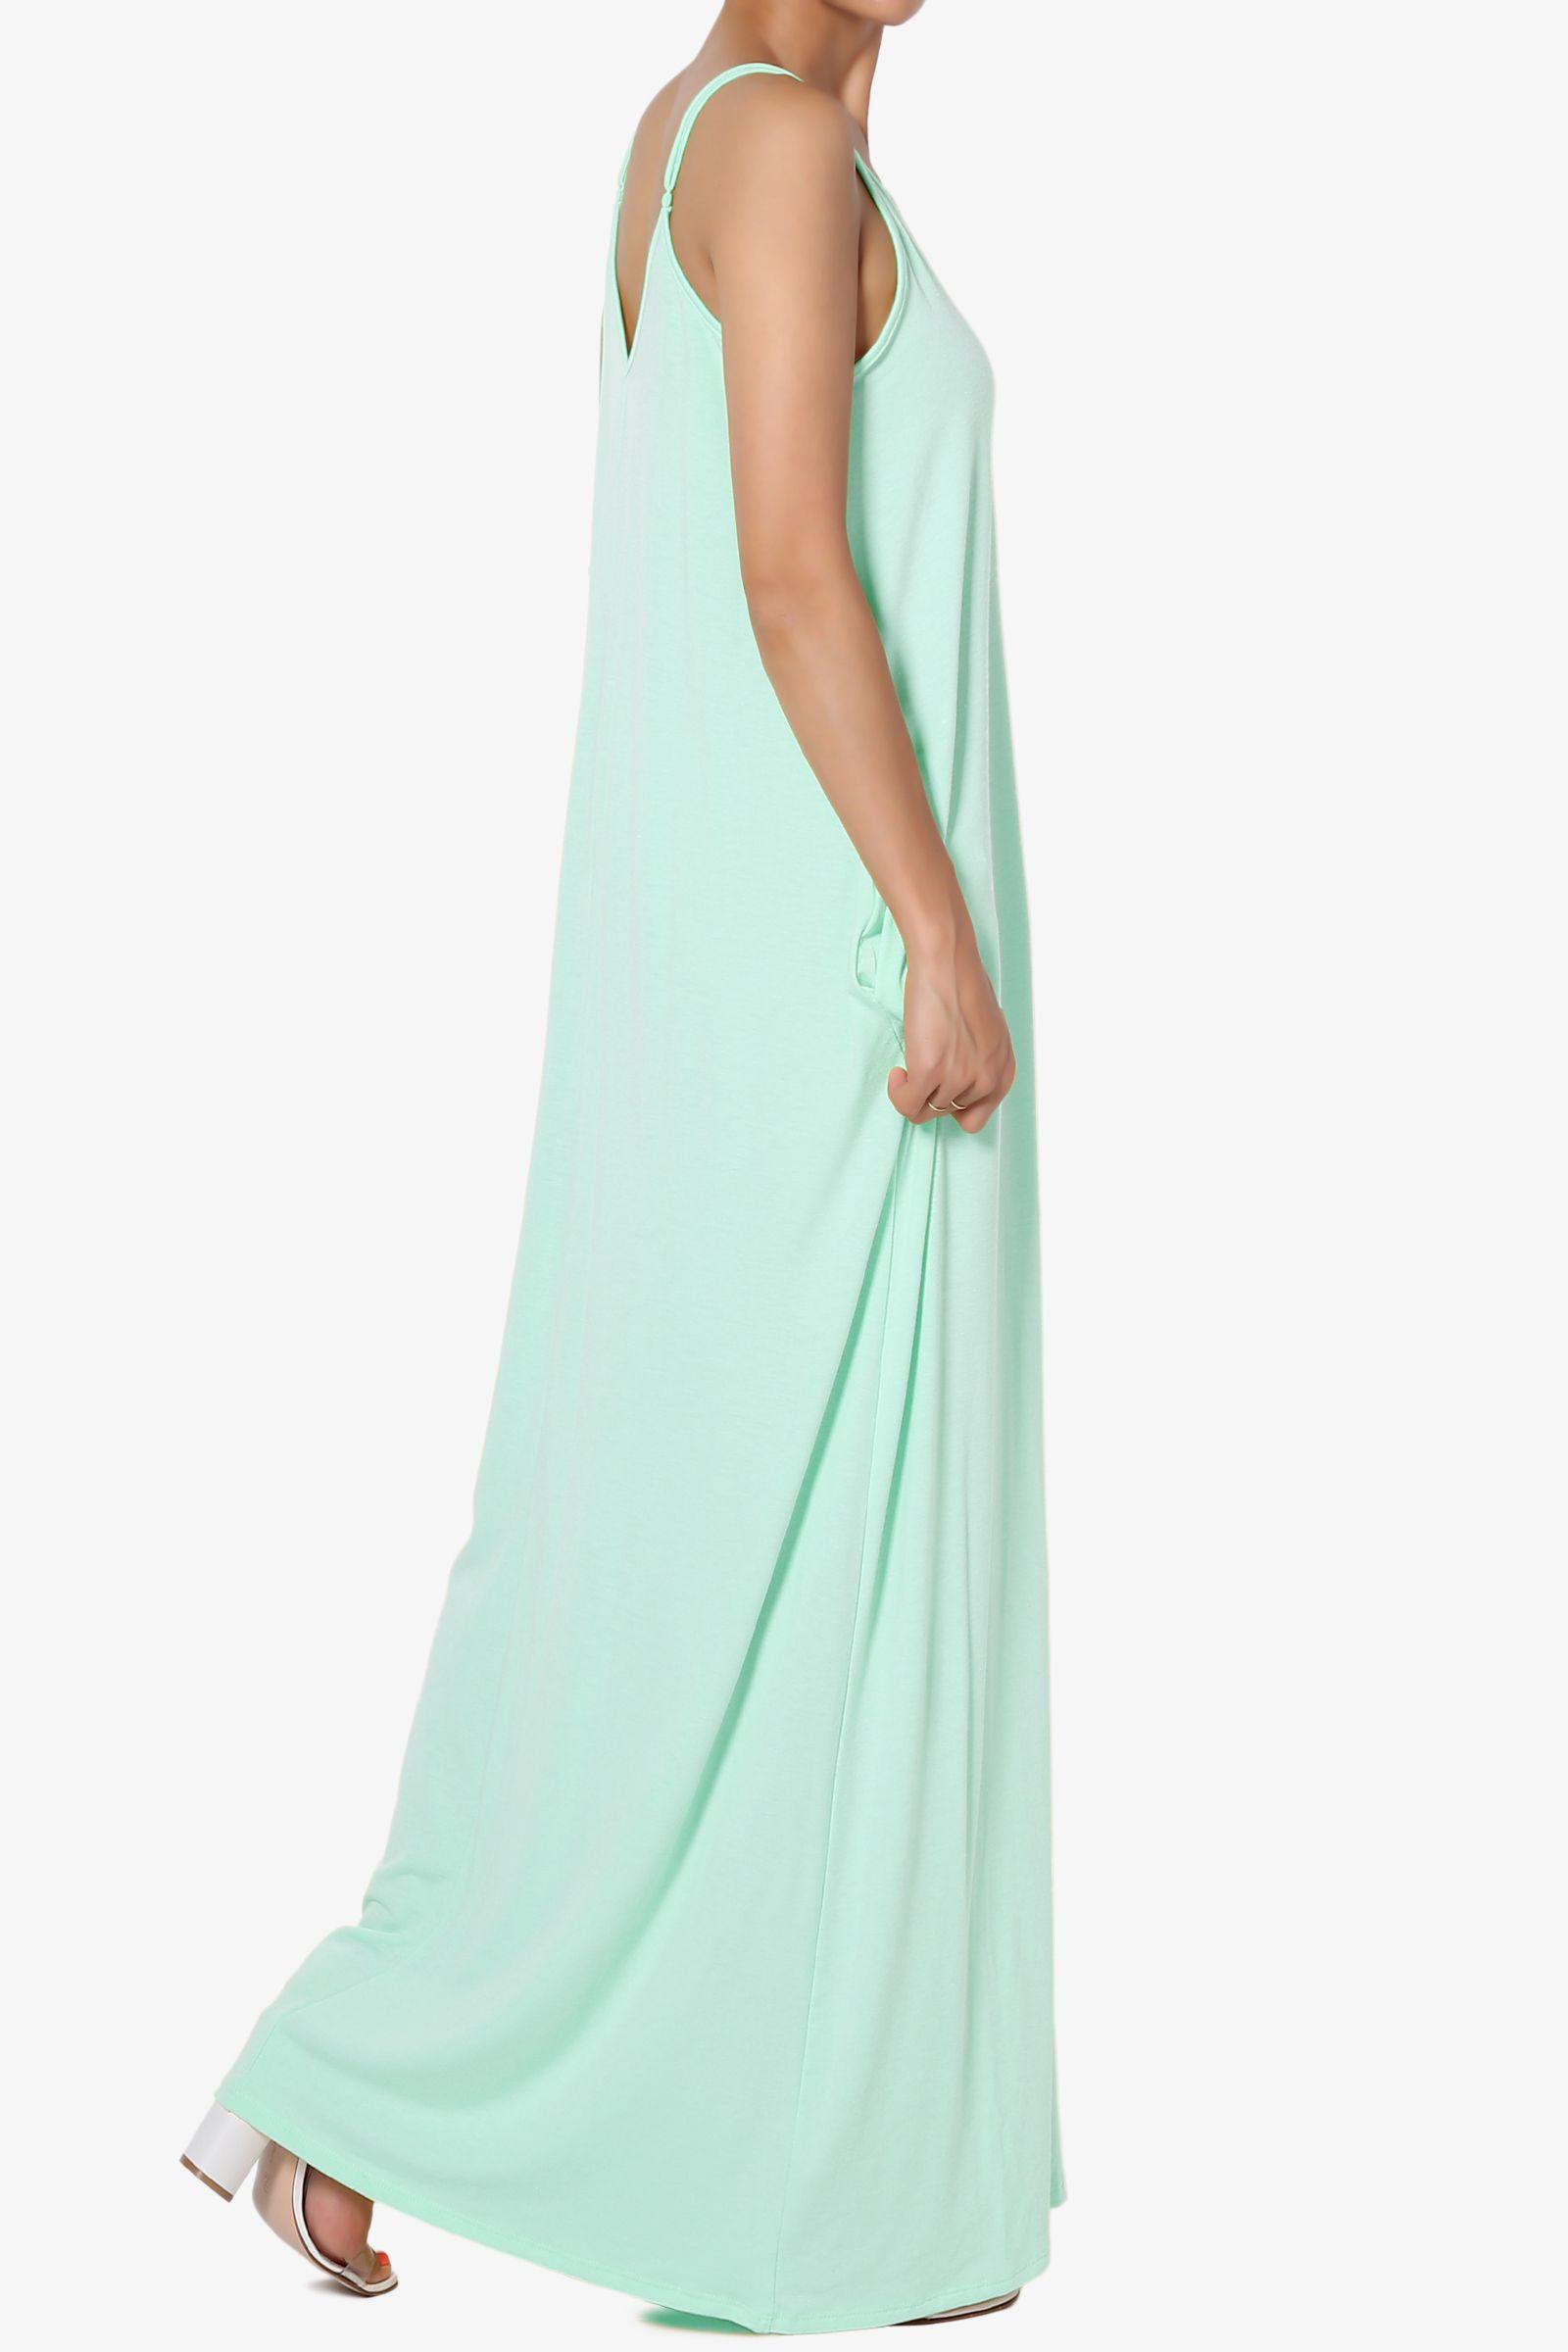 Themogan Themogan Women S Plus V Neck Draped Jersey Casual Beach Cami Long Maxi Dress W Pocket Walmart Com Long Maxi Dress Maxi Dress Dresses [ 2400 x 1600 Pixel ]